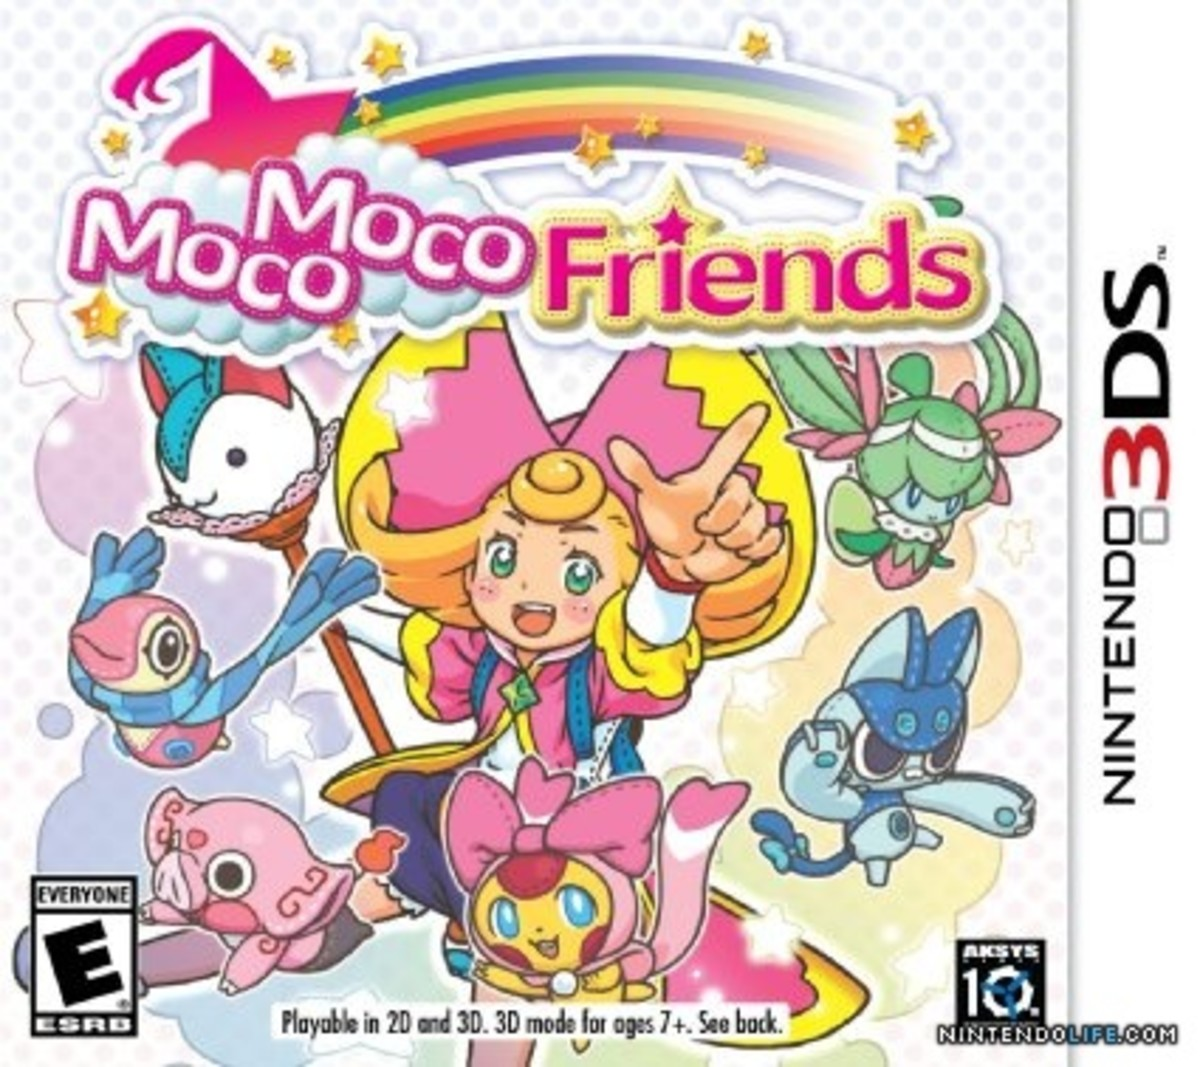 Moco Moco Friends cover art.